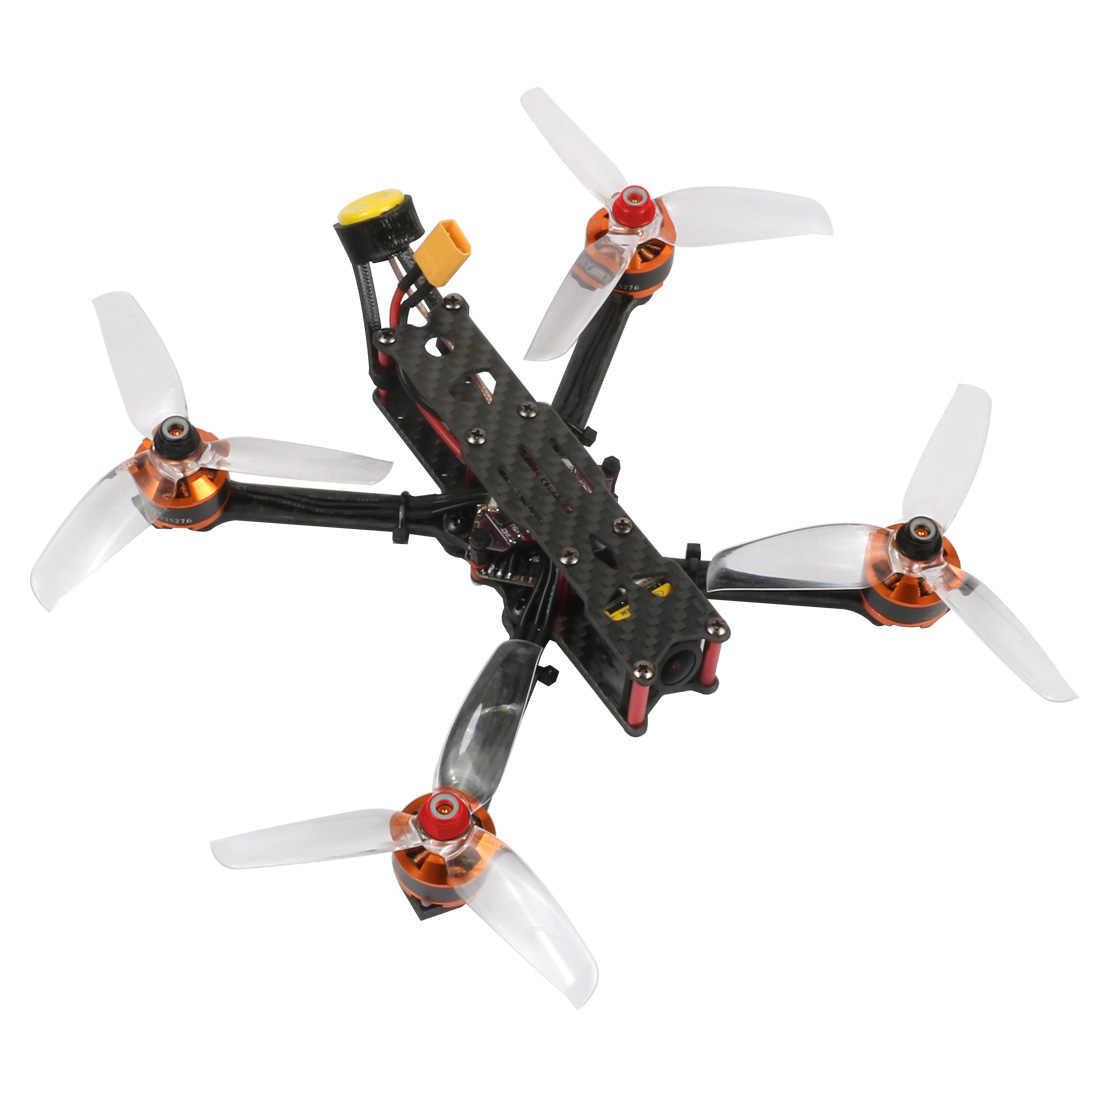 JMT F4 X1 175mm FPV yarış Drone ile PNP GHF411AIO F4 2-6S AIO uçuş kontrolörü 35A ESC ratel FPV kamera Supra-VTX Quadcopter